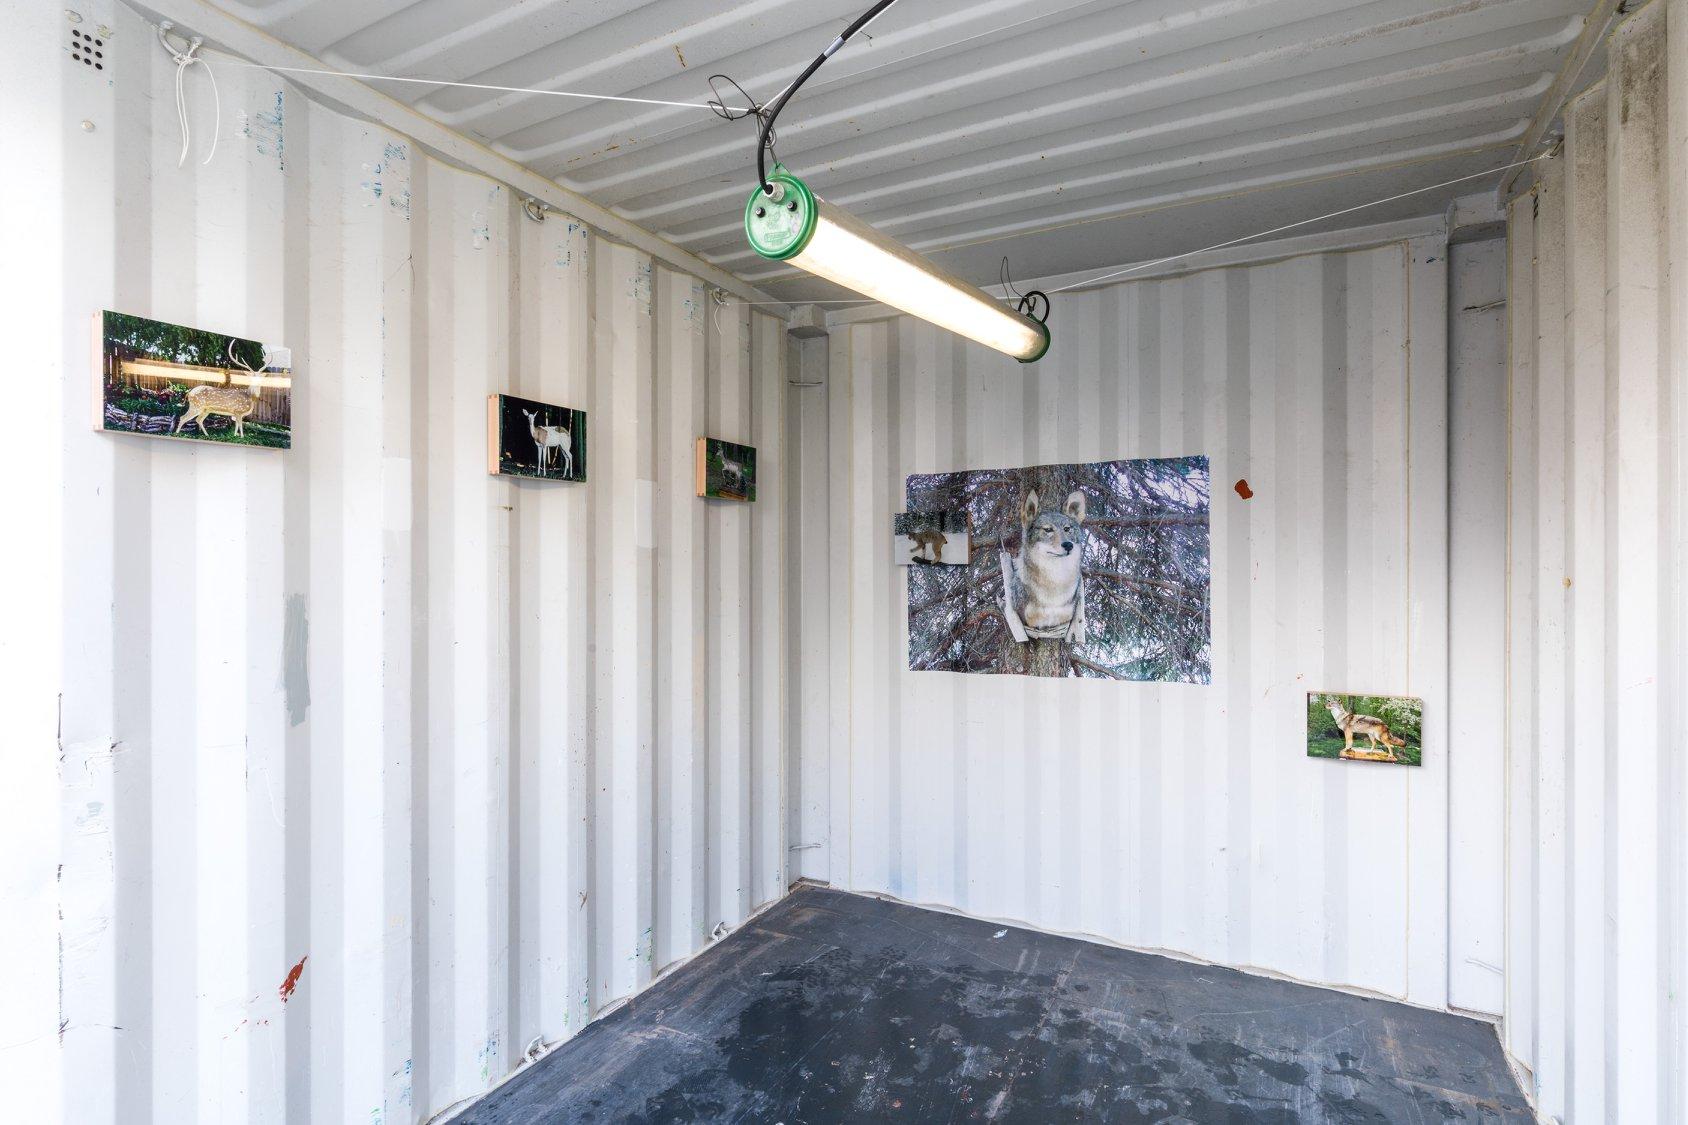 Robin Butter Rotterdam Photo Festival 2018 After All I Still Want A Fox